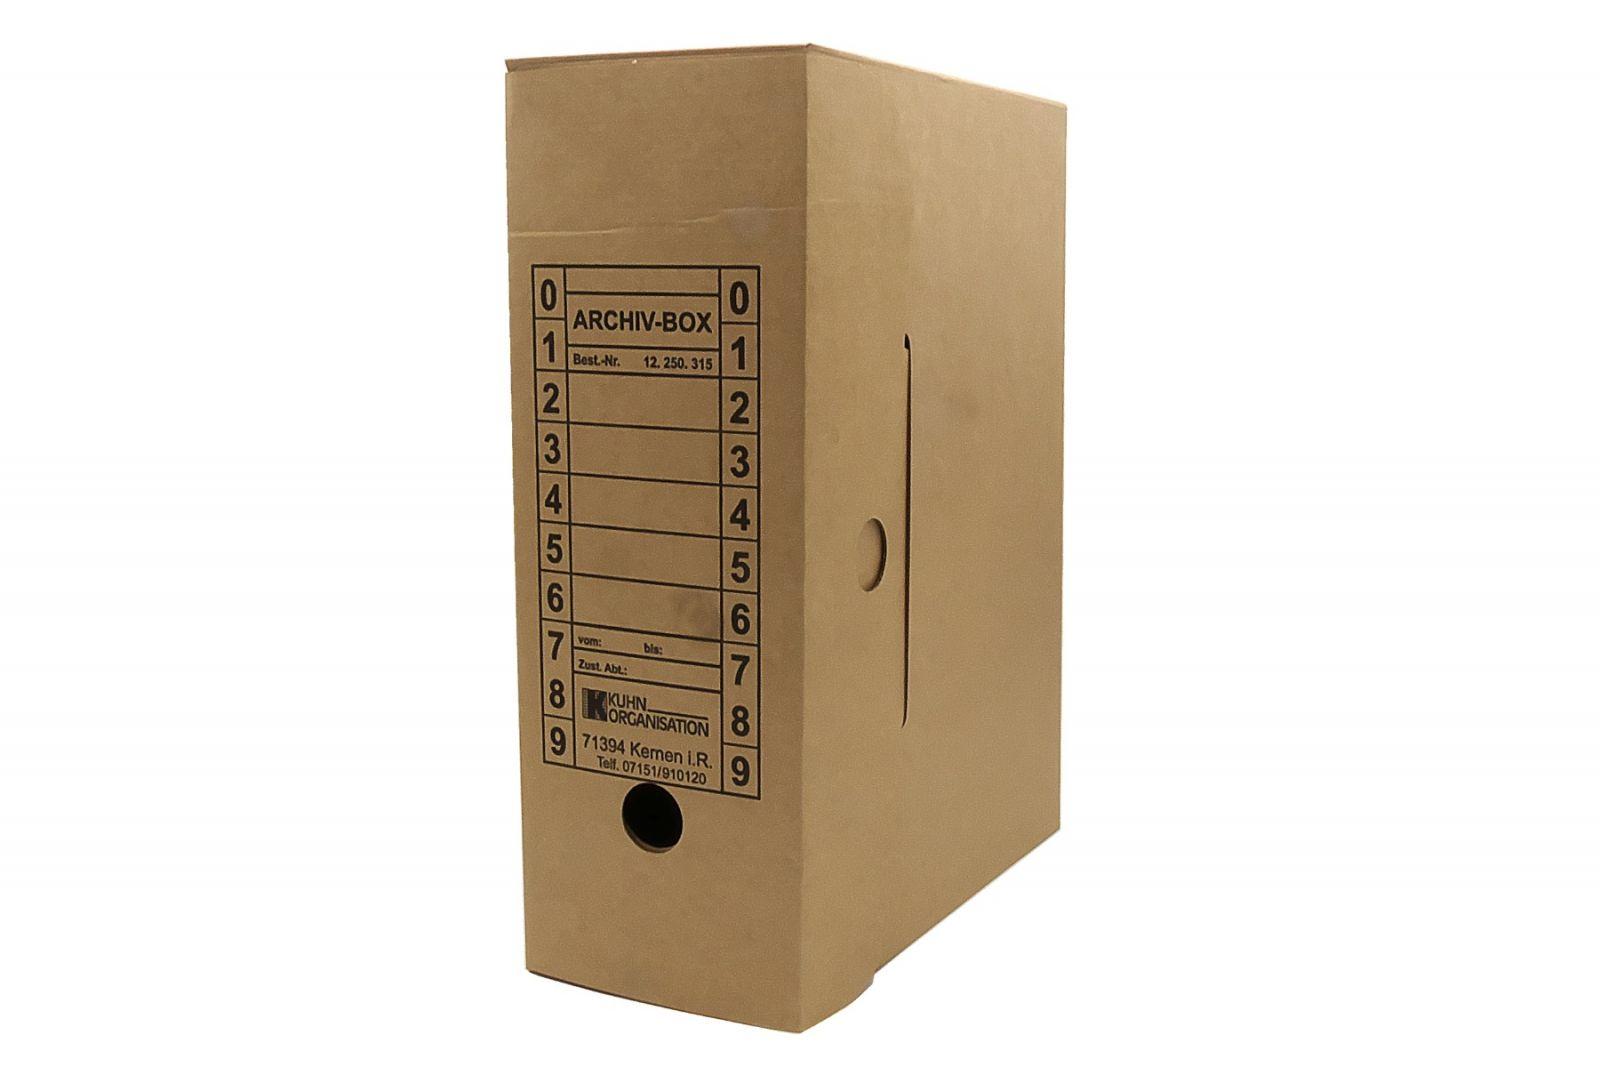 Archivbox 12.250.315